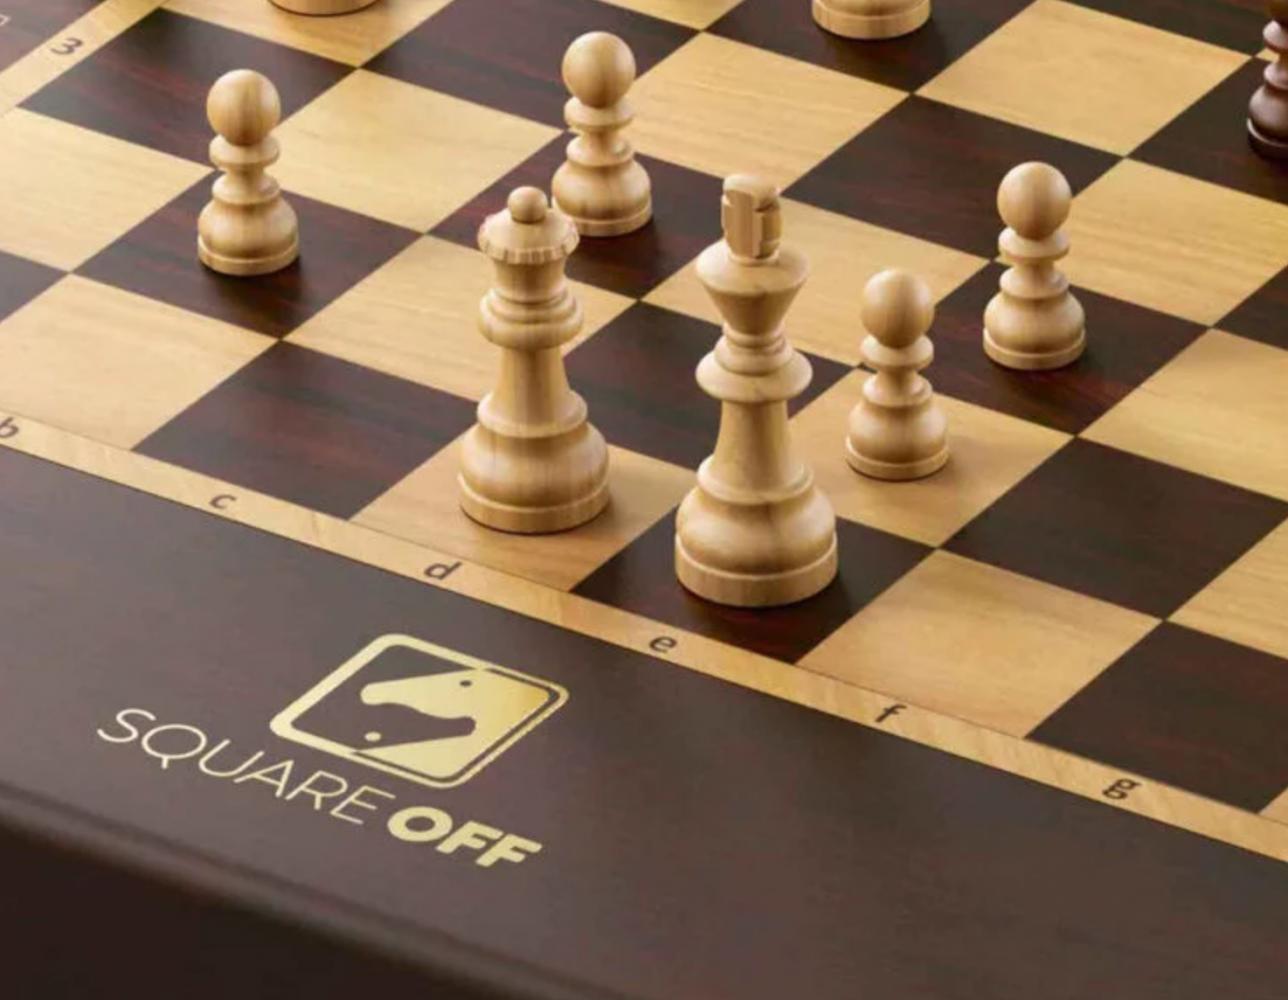 tabuleiro de xadrez futuro 1